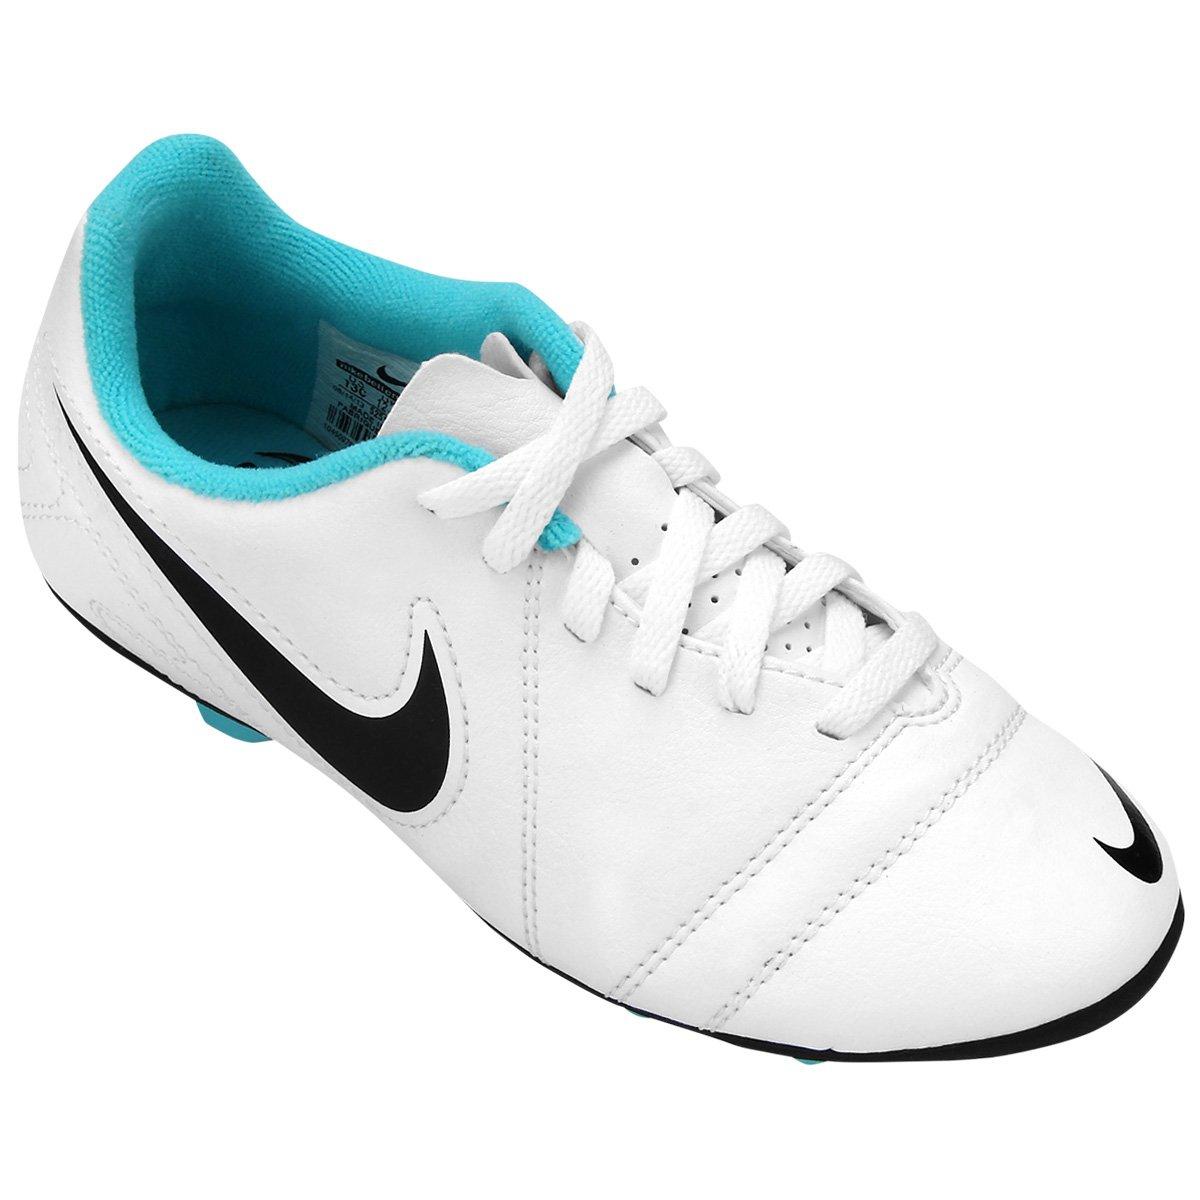 Chuteira Nike CTR360 Enganche 3 FG-R Infantil - Compre Agora  df771918ba039